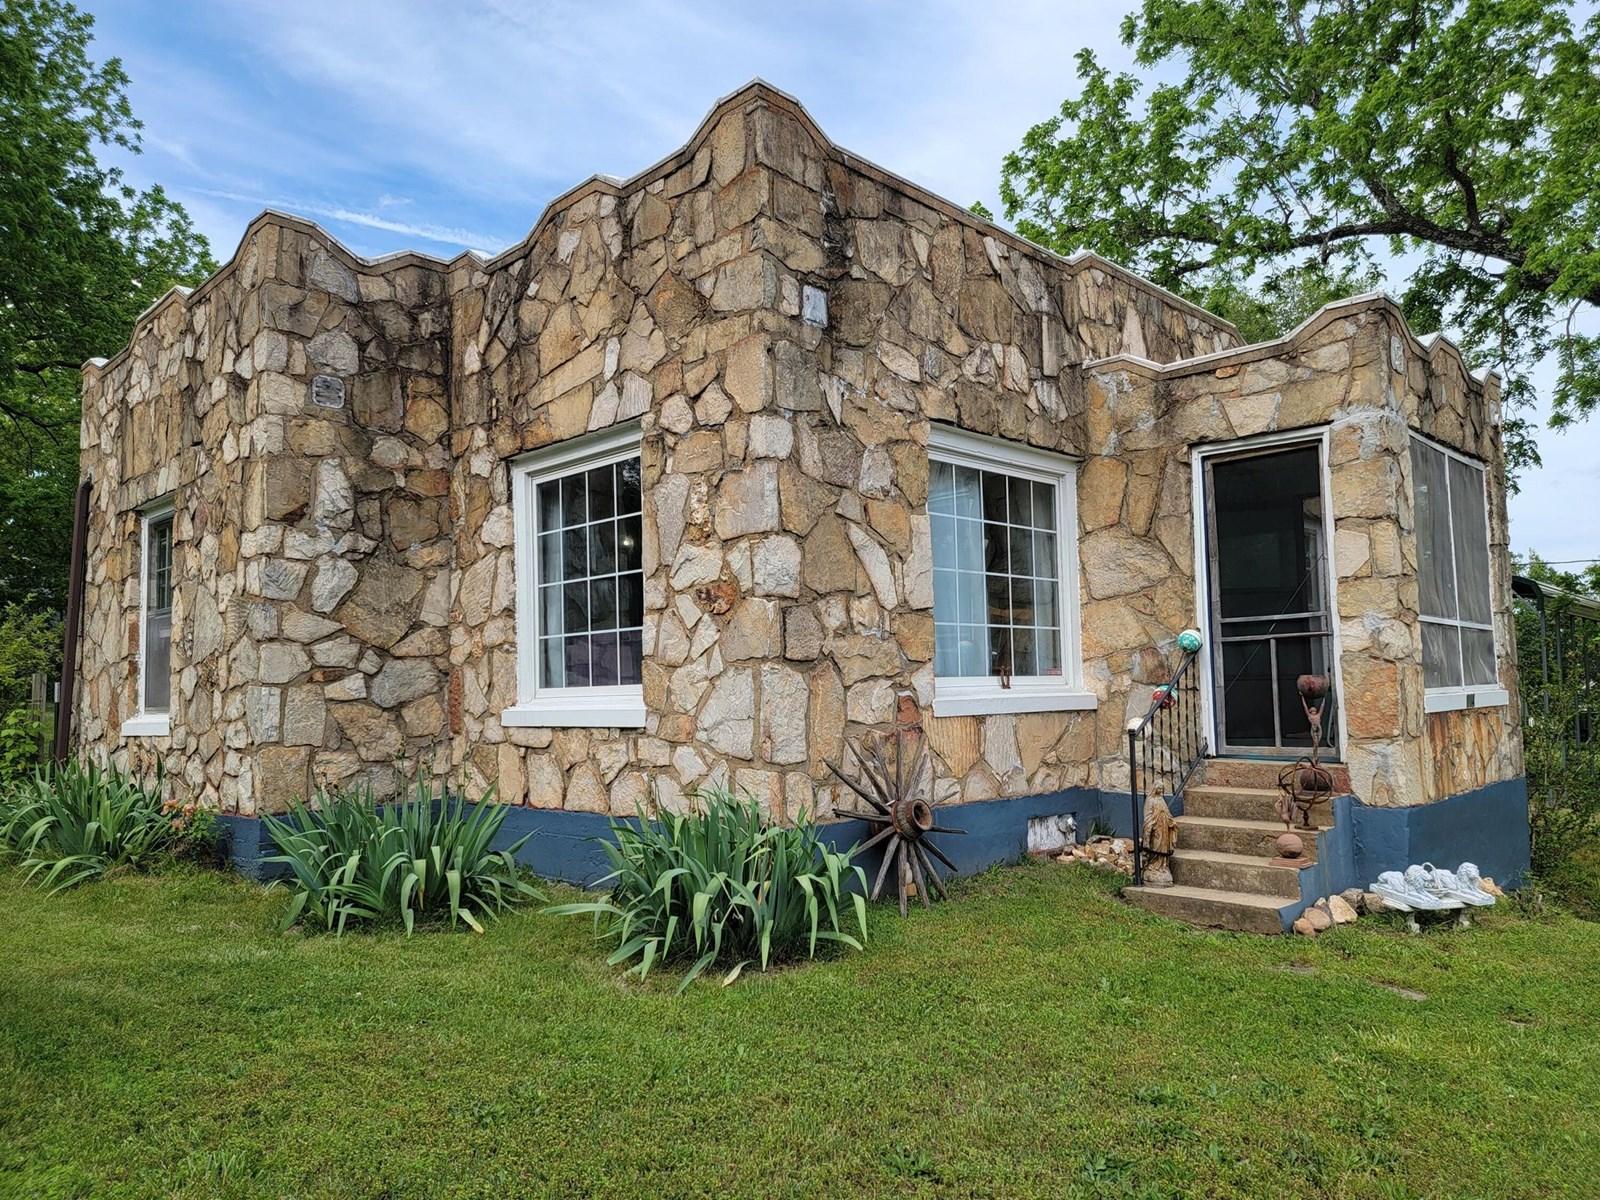 Home for Sale in Missouri